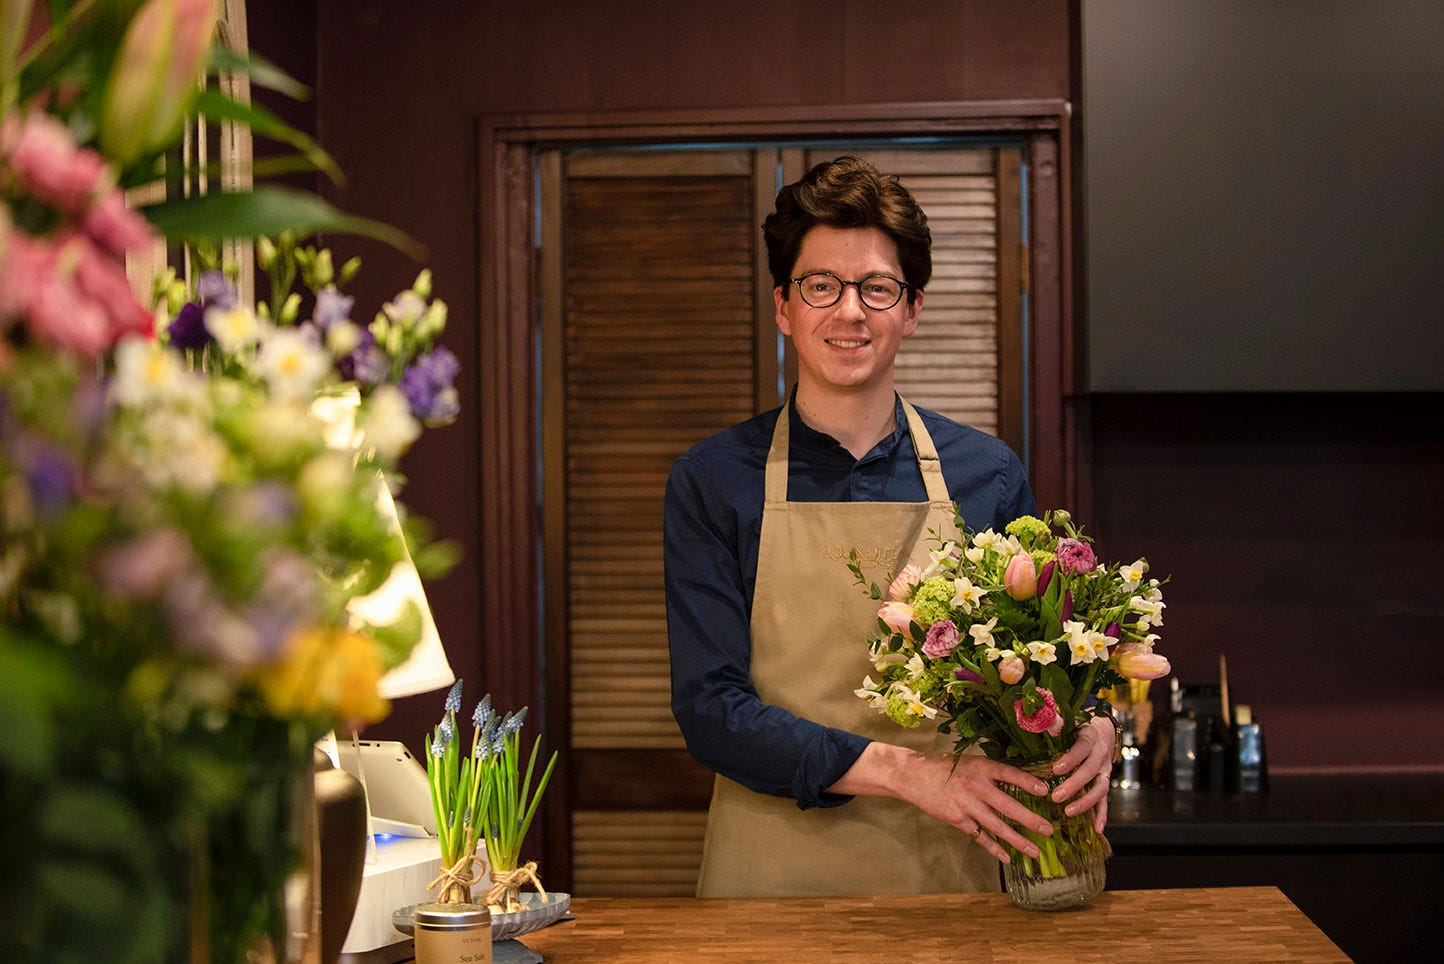 Florist Jake holding spring bouquet